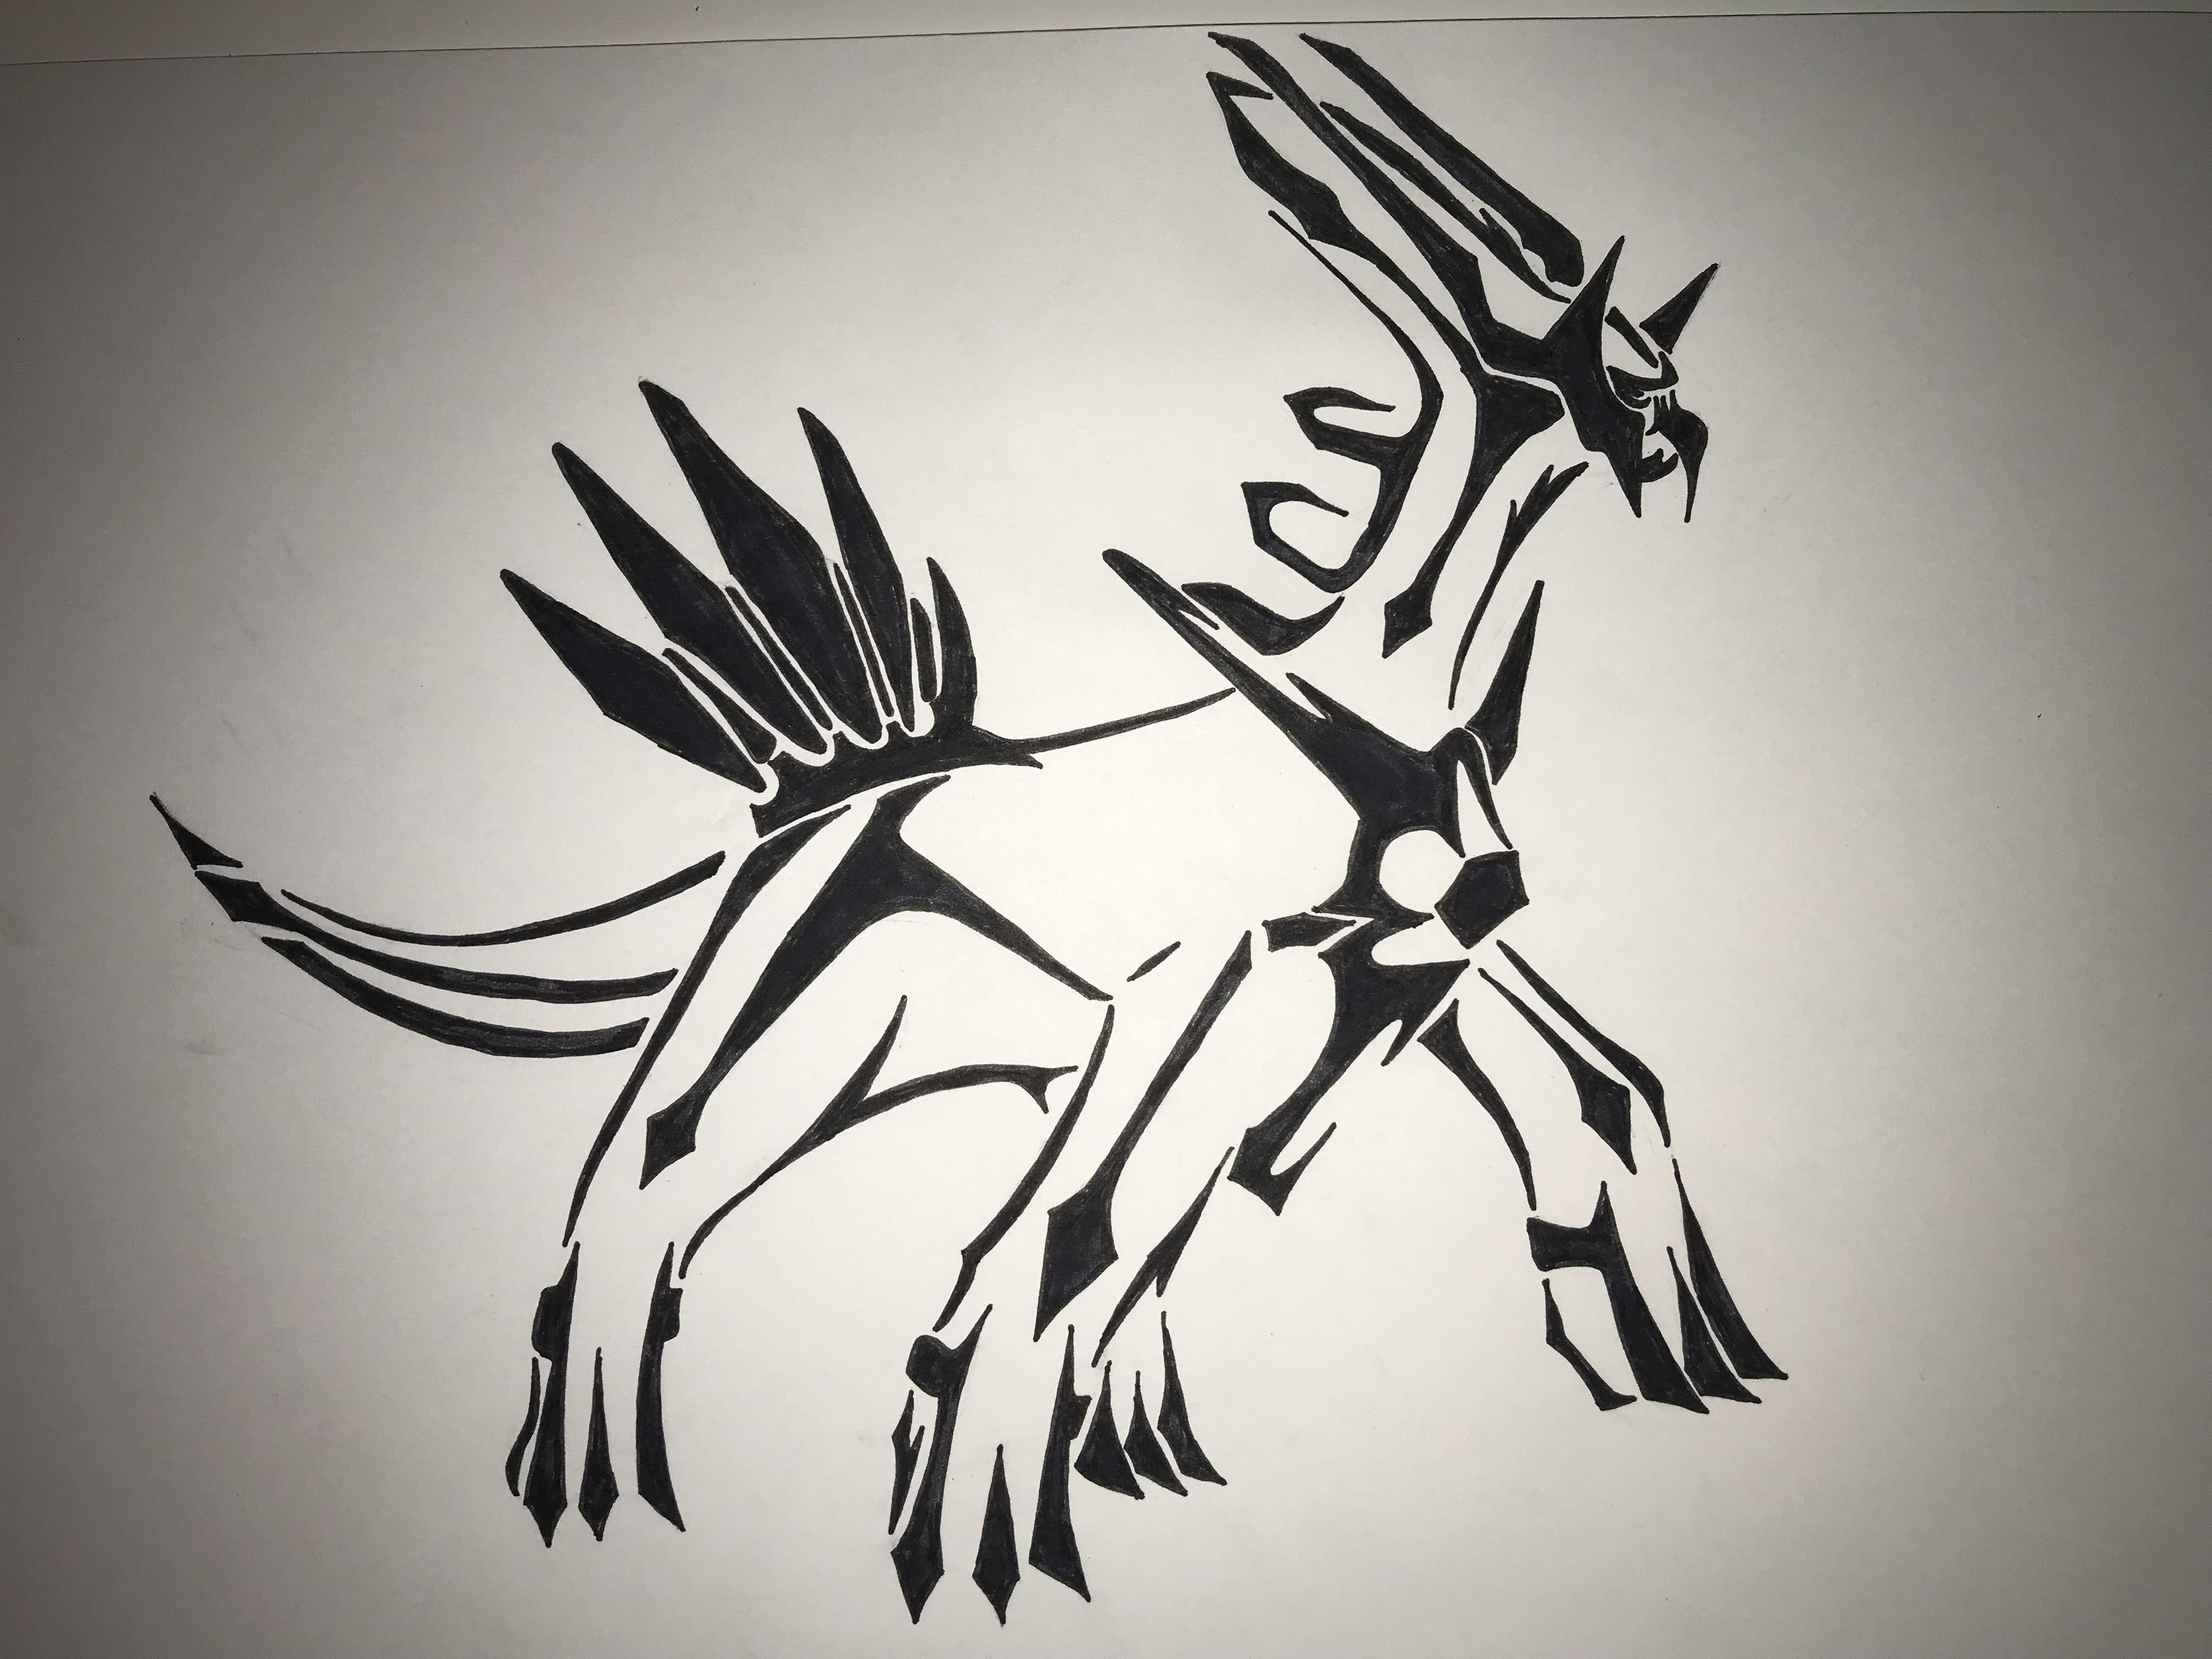 4032x3024 Pin By Dan Benedum On Drawing Tribal Art